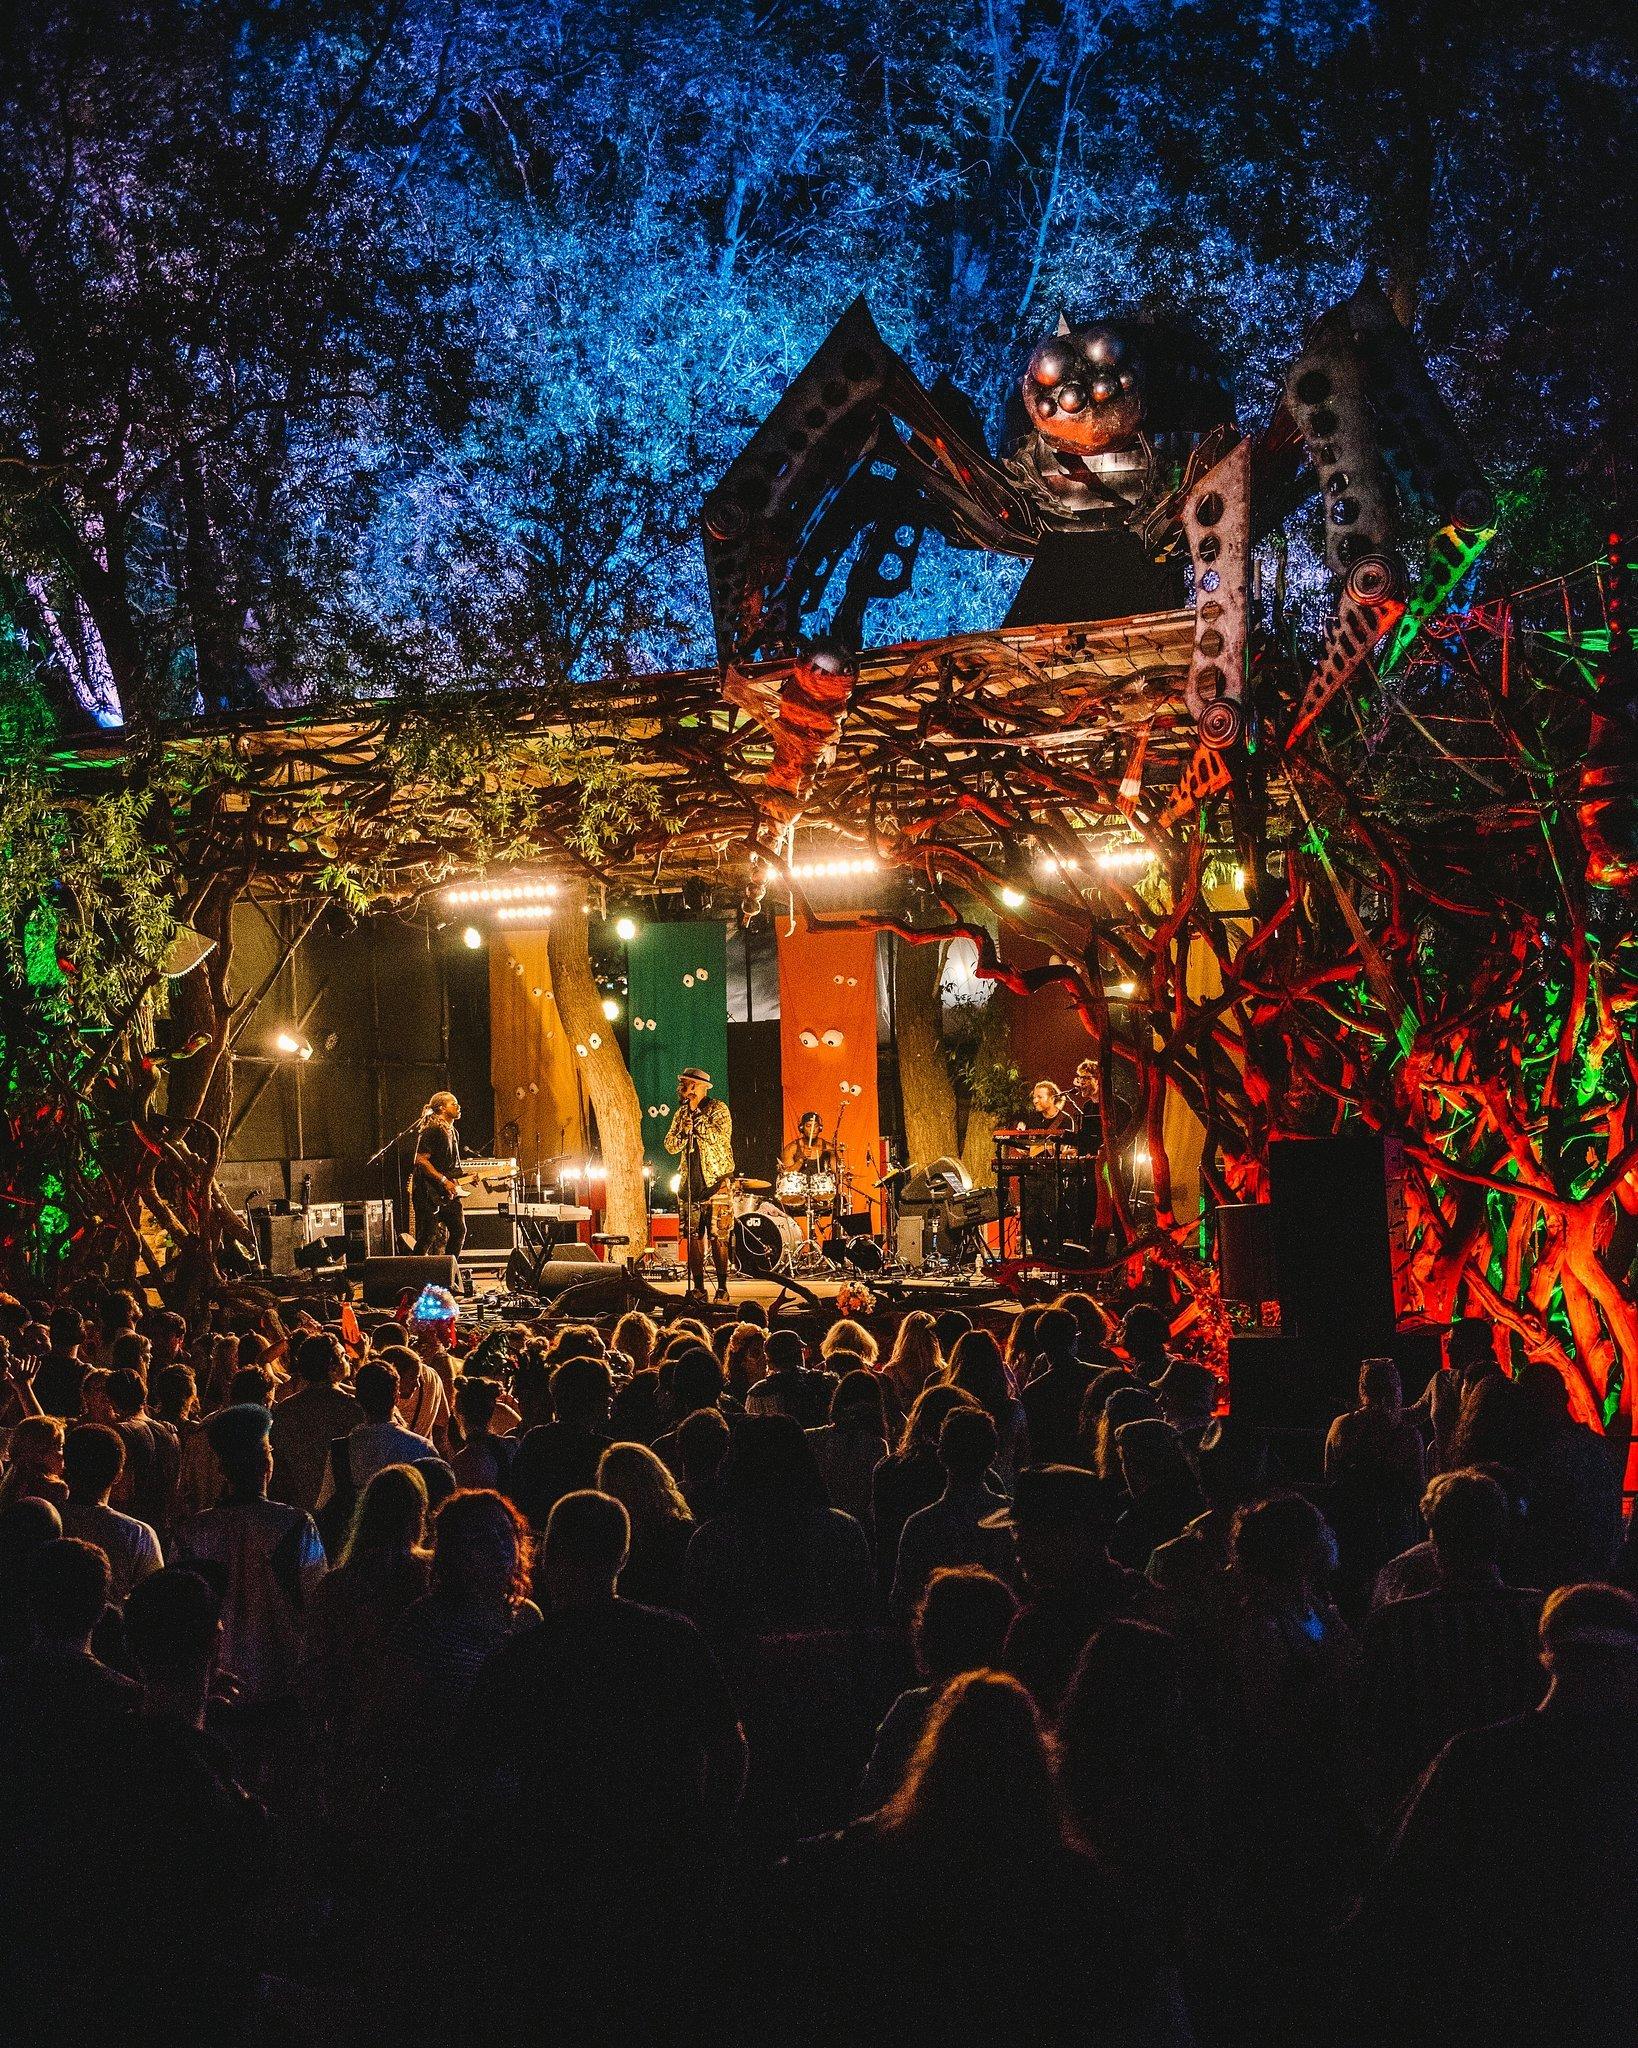 Secret Garden Party 2016 w/ Air, Band of Skulls, Caribou, Rae Morris ...